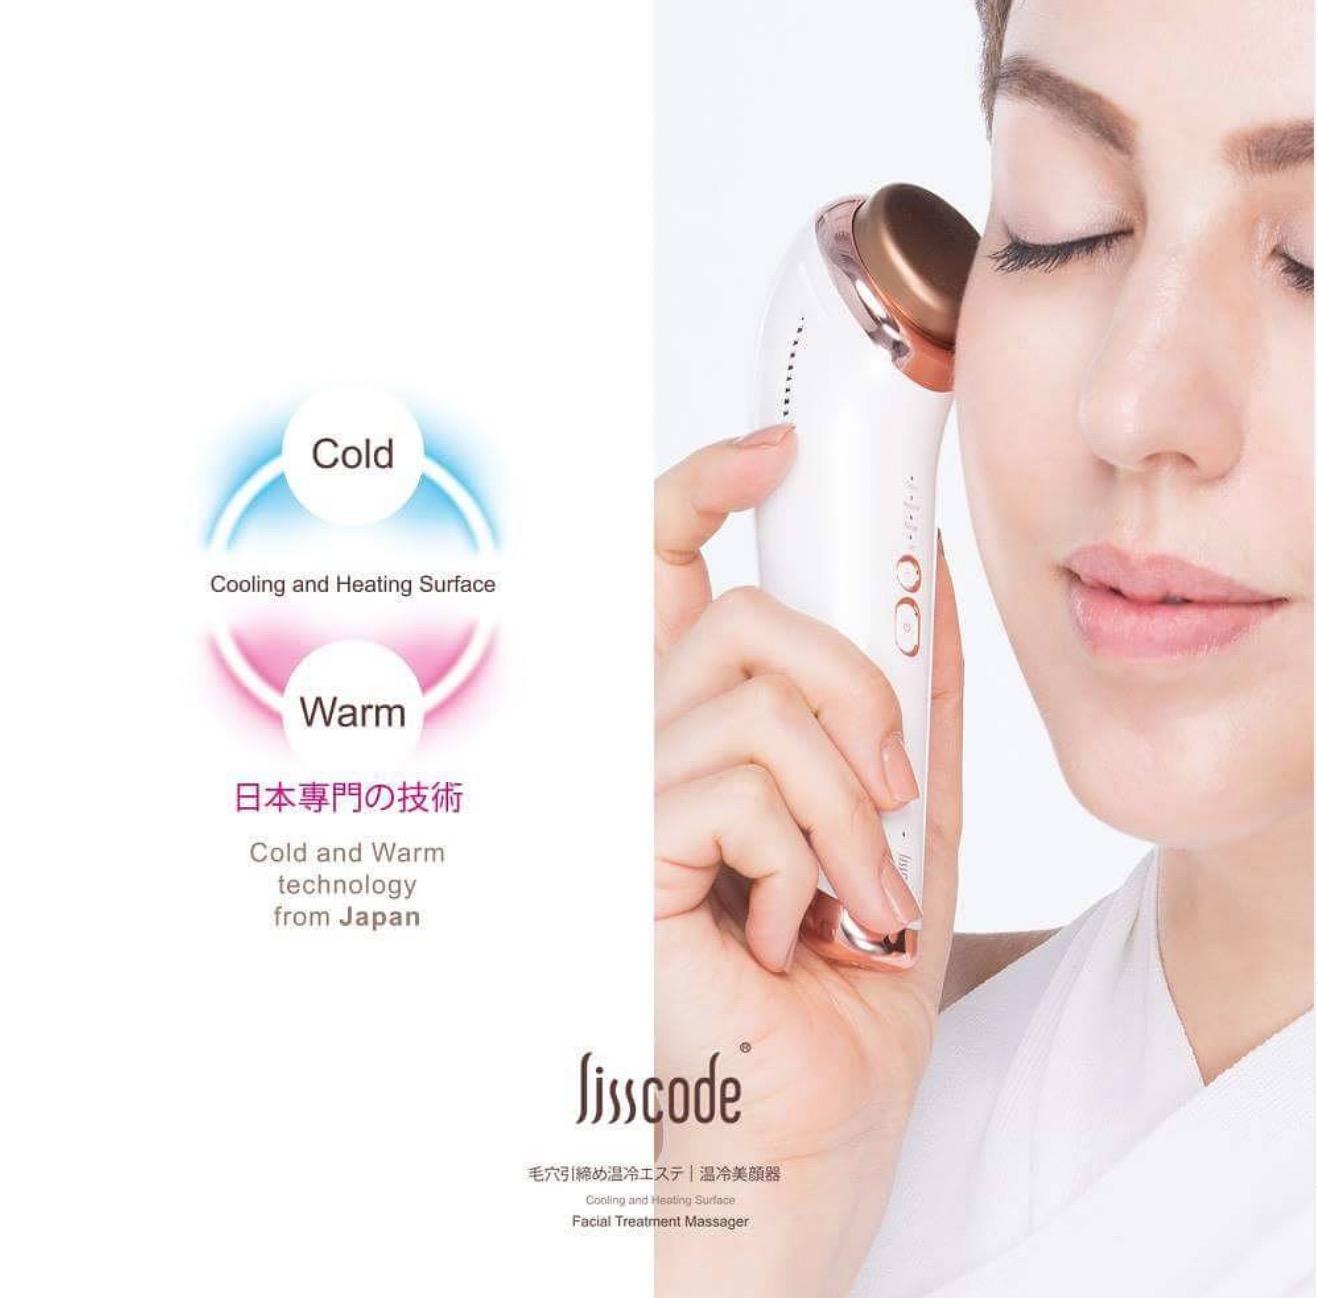 10°C冰冷美肌,收斂毛孔的模式,讓你在清除粉刺後亦可有效保養,維持肌膚彈性透亮。